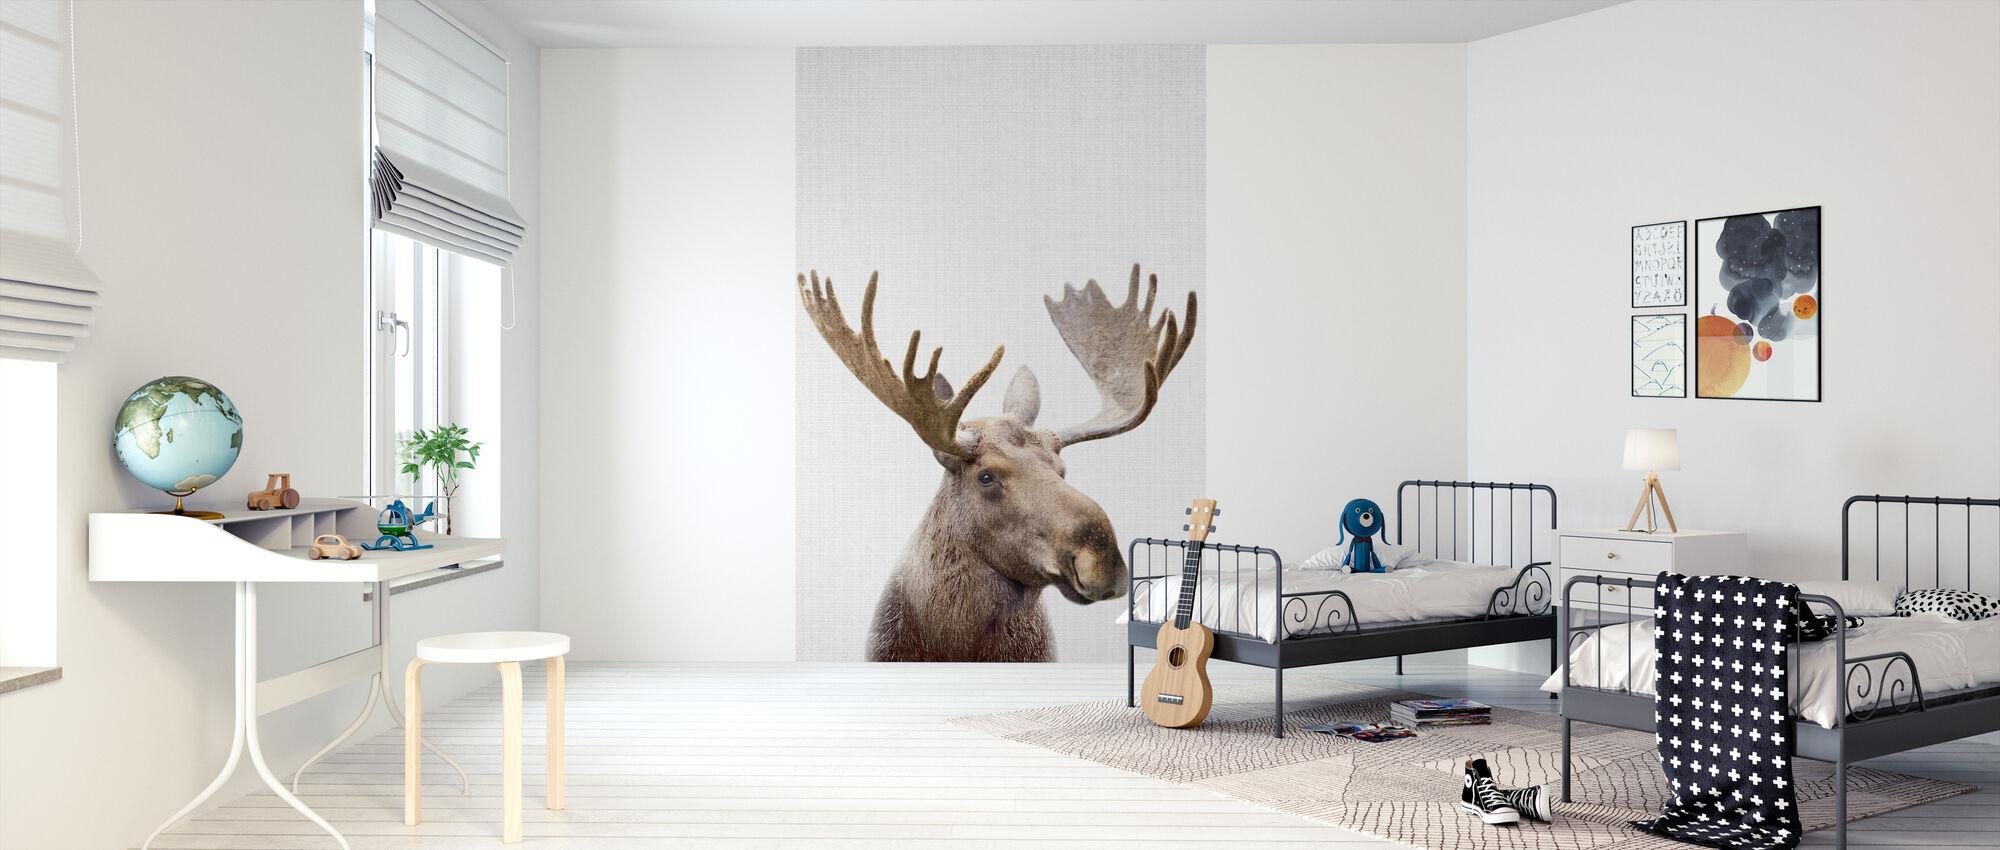 Moose - Wallpaper - Kids Room